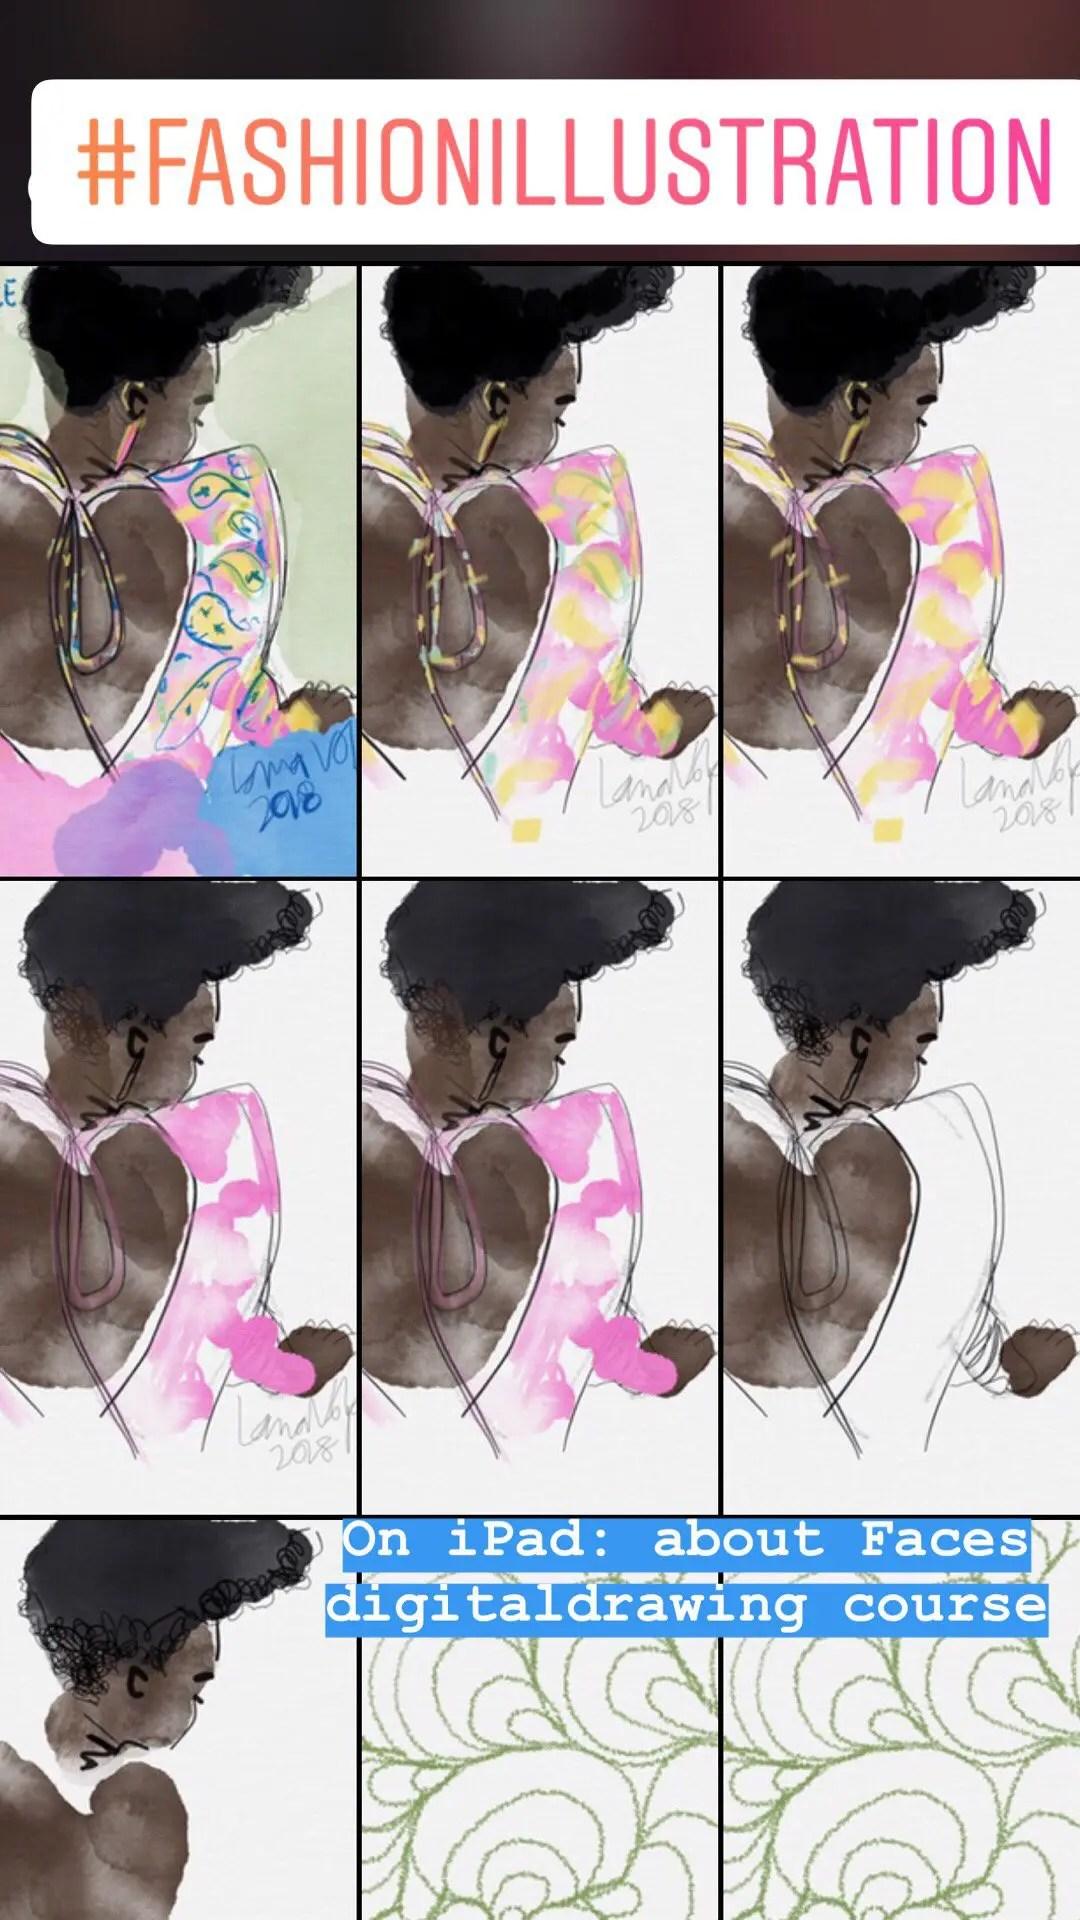 My Favorite Digital Watercolor App For Fashion Art